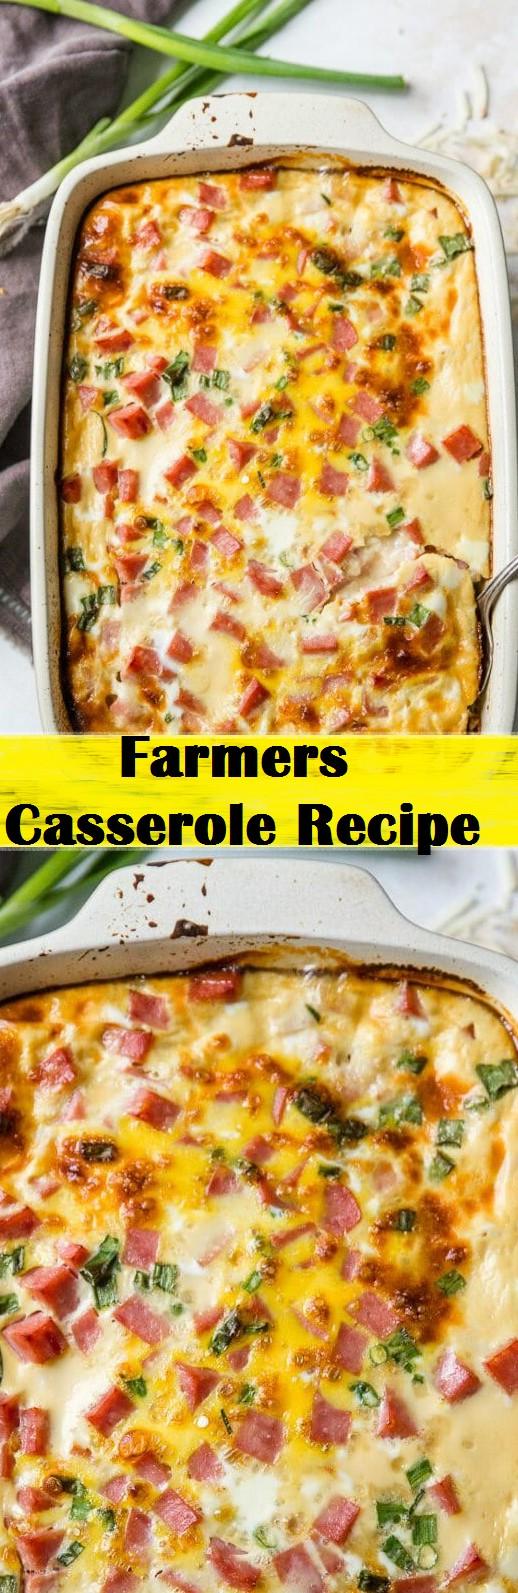 Farmers Casserole Recipe